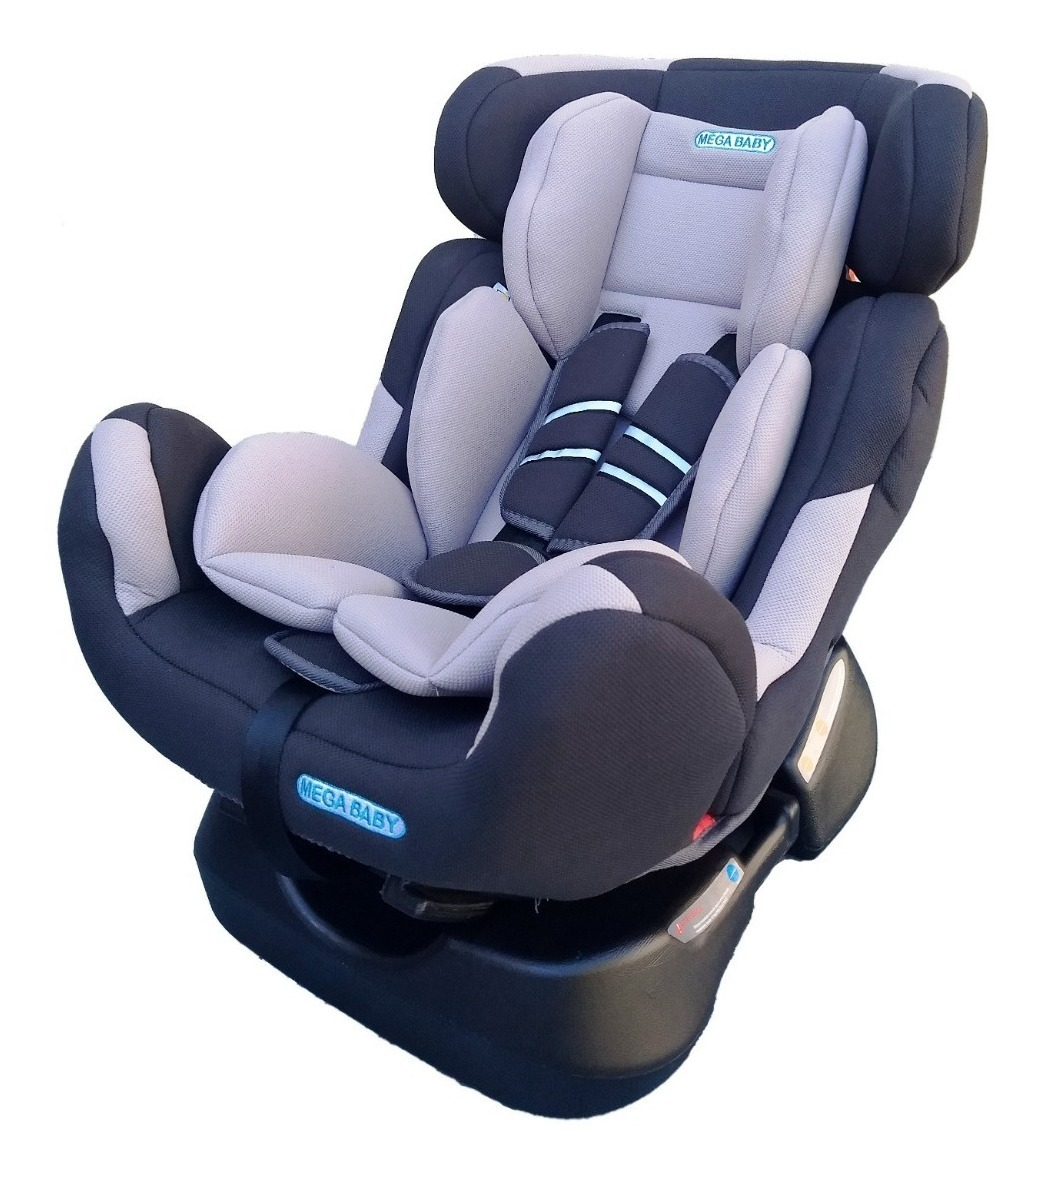 799b851c0 Butaca O Silla Para Auto De Bebé Mega Baby 0 A 25 Kg - $ 3.490,00 en ...